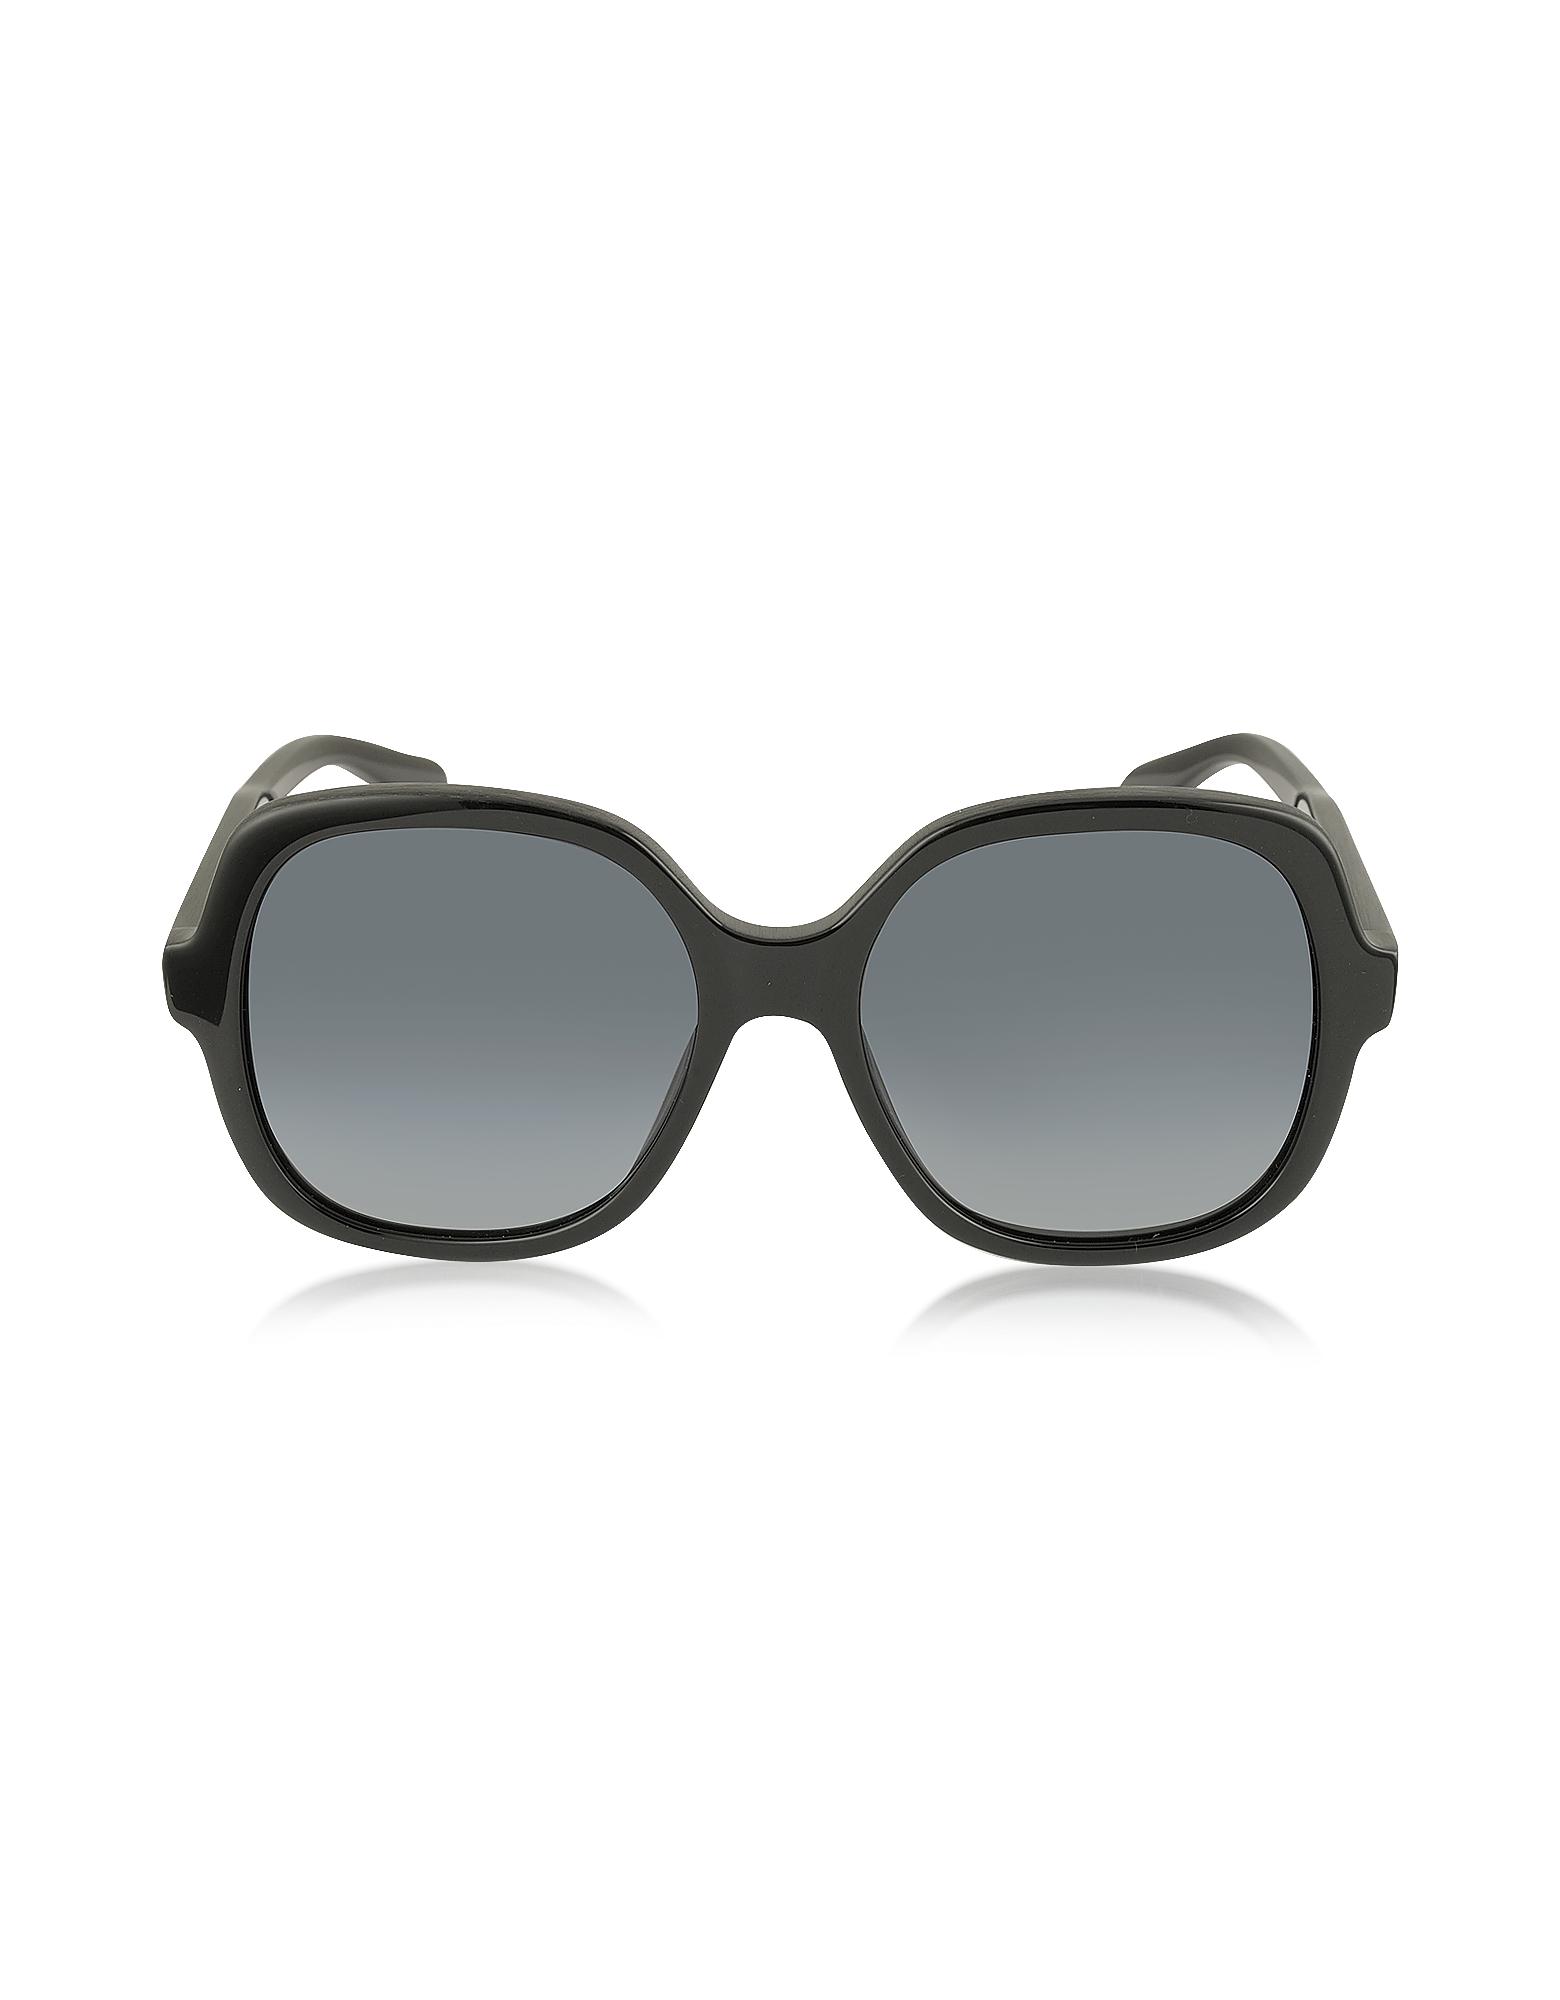 Marc Jacobs Sunglasses, MJ 589/S 807HD Rounded Square Black Oversized Acetate Women's Sunglasses